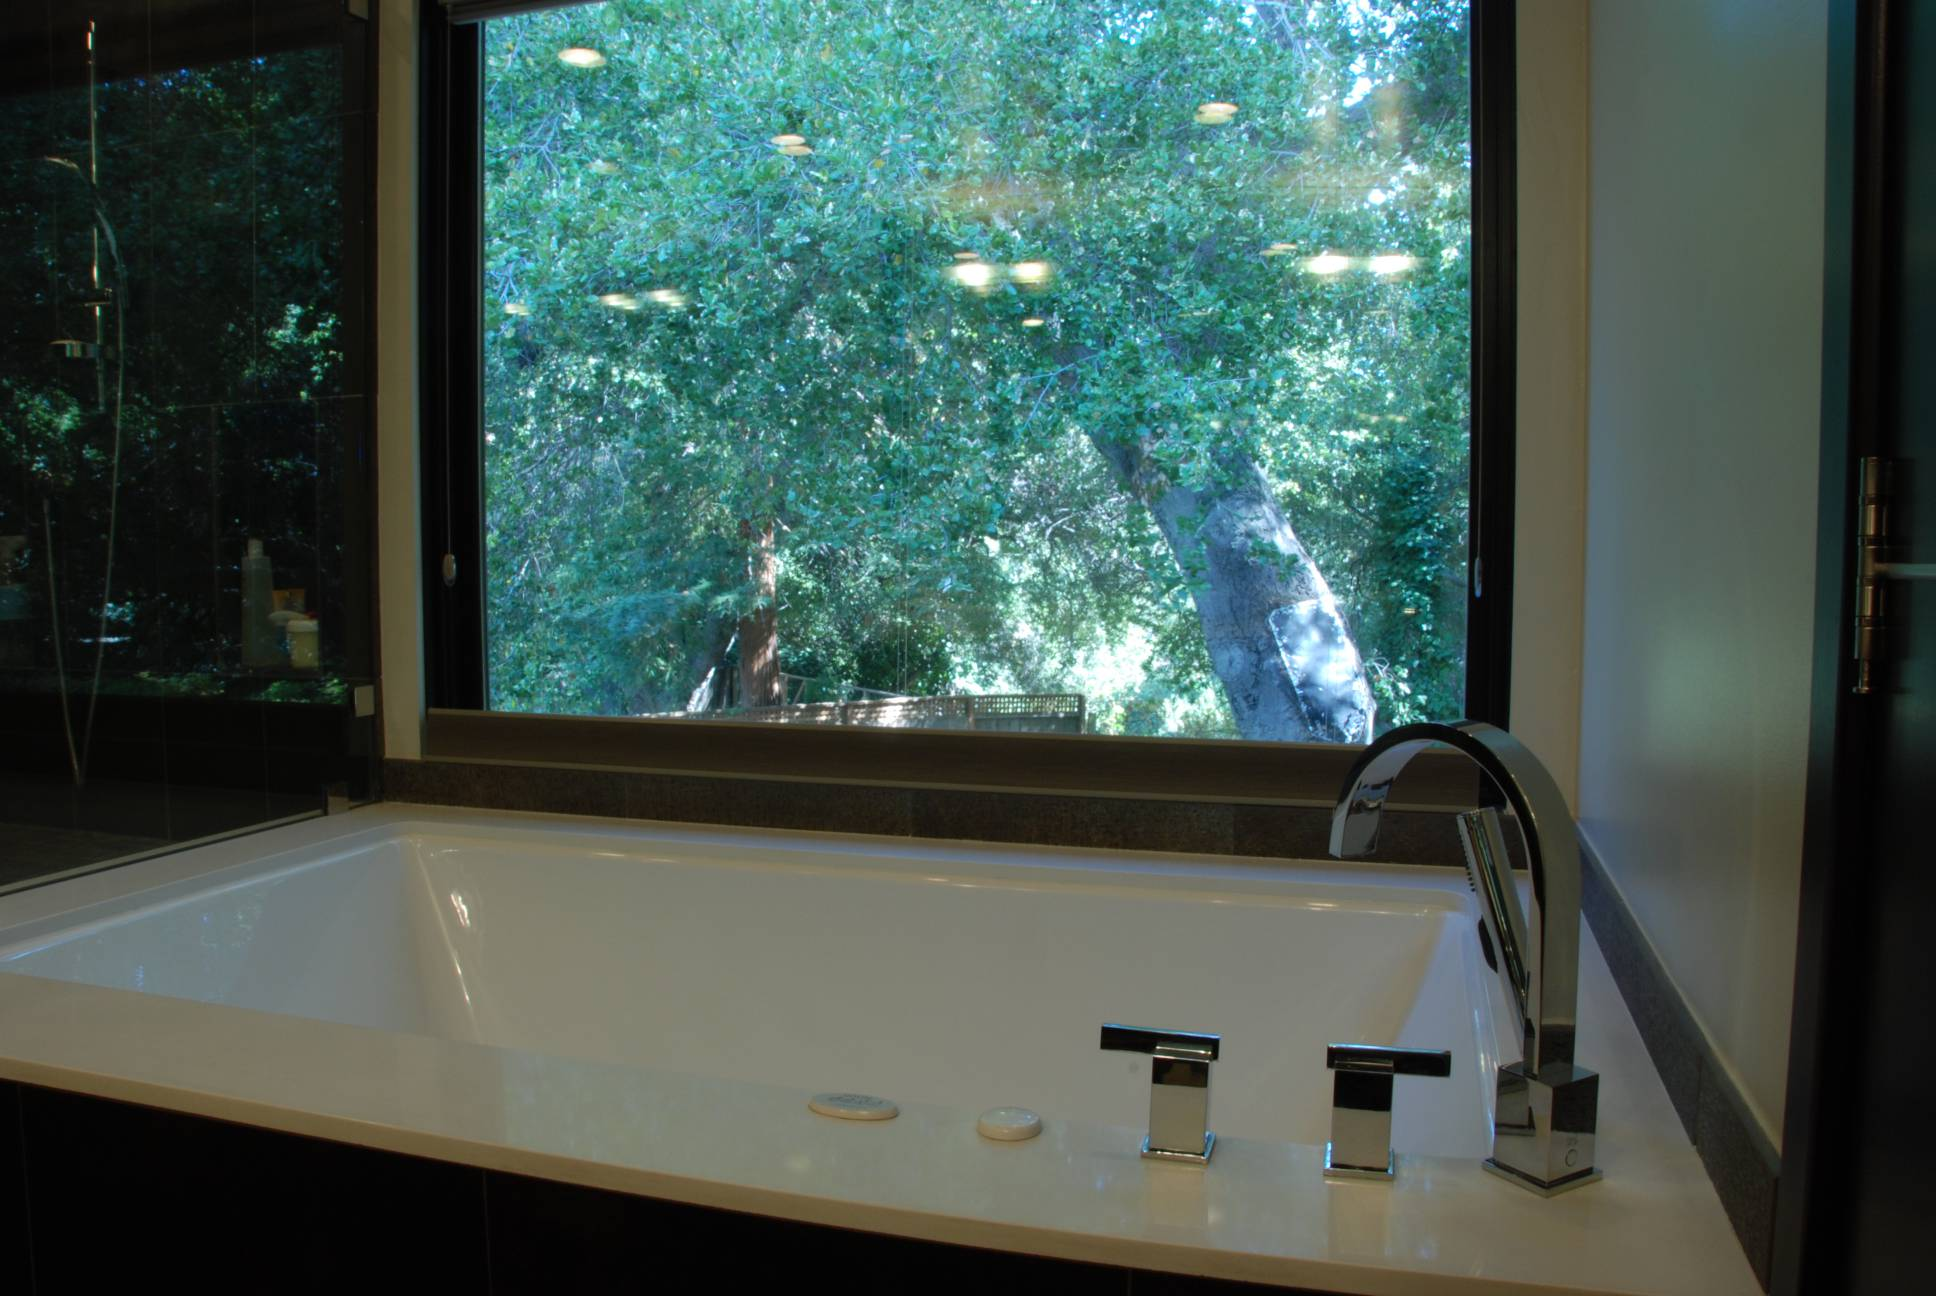 Hot Tub with View, architect design, Los Altos